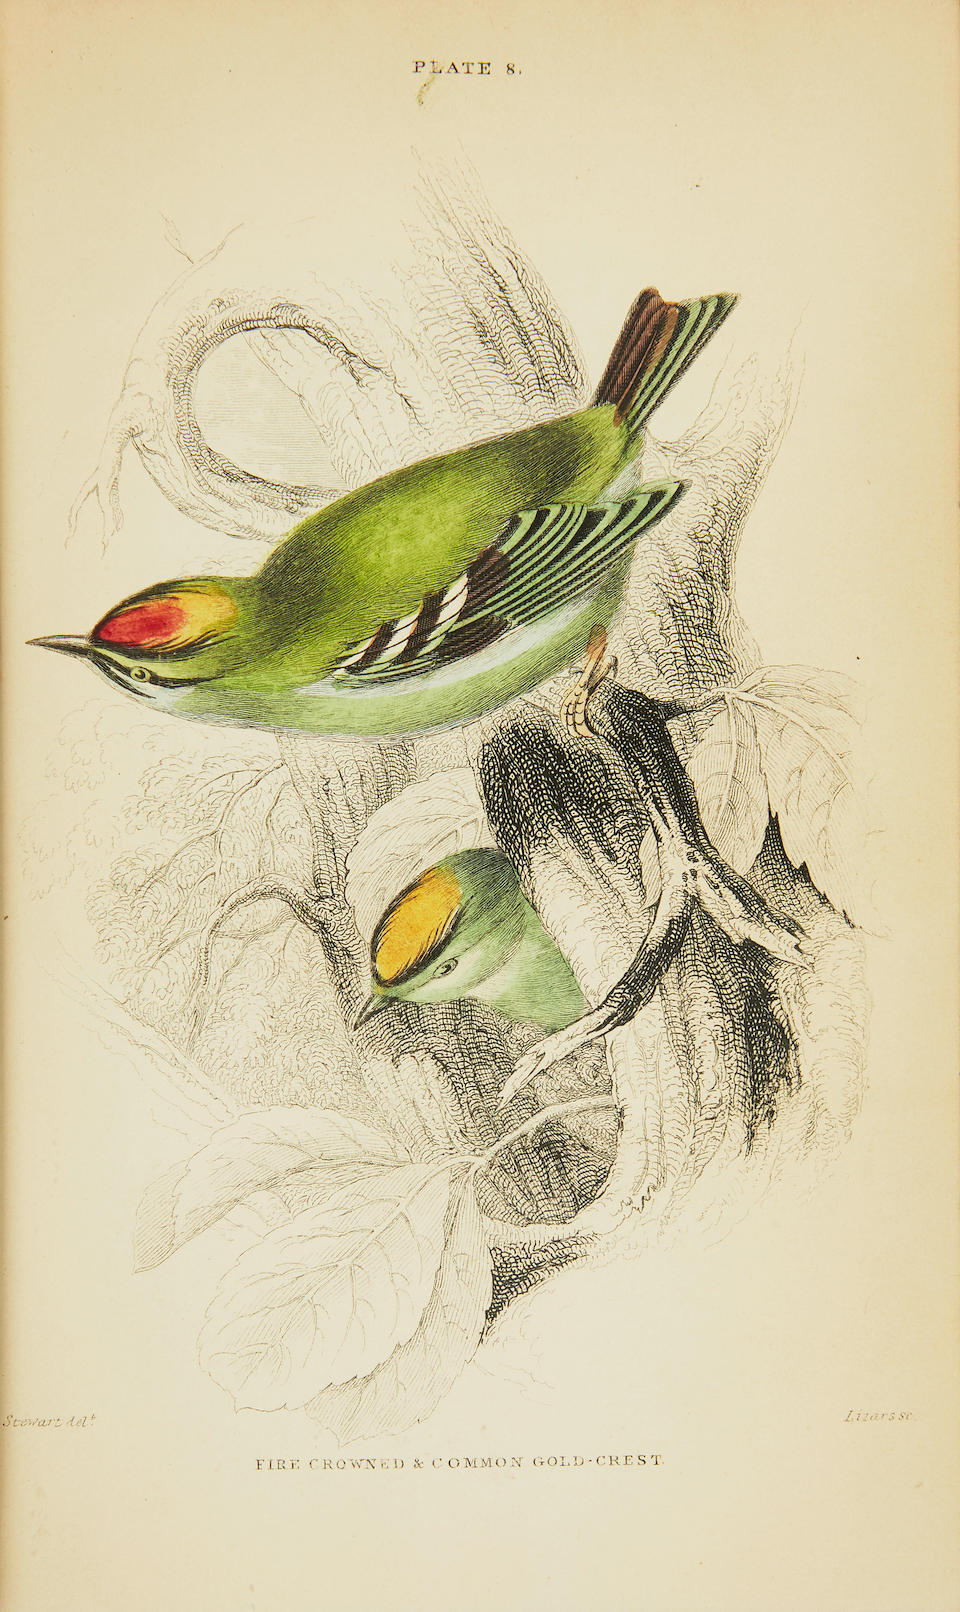 JARDINE, WILLIAM. 1800-1874. The Naturalist's Library. Edinburgh: W.H. Lizars, [1843].